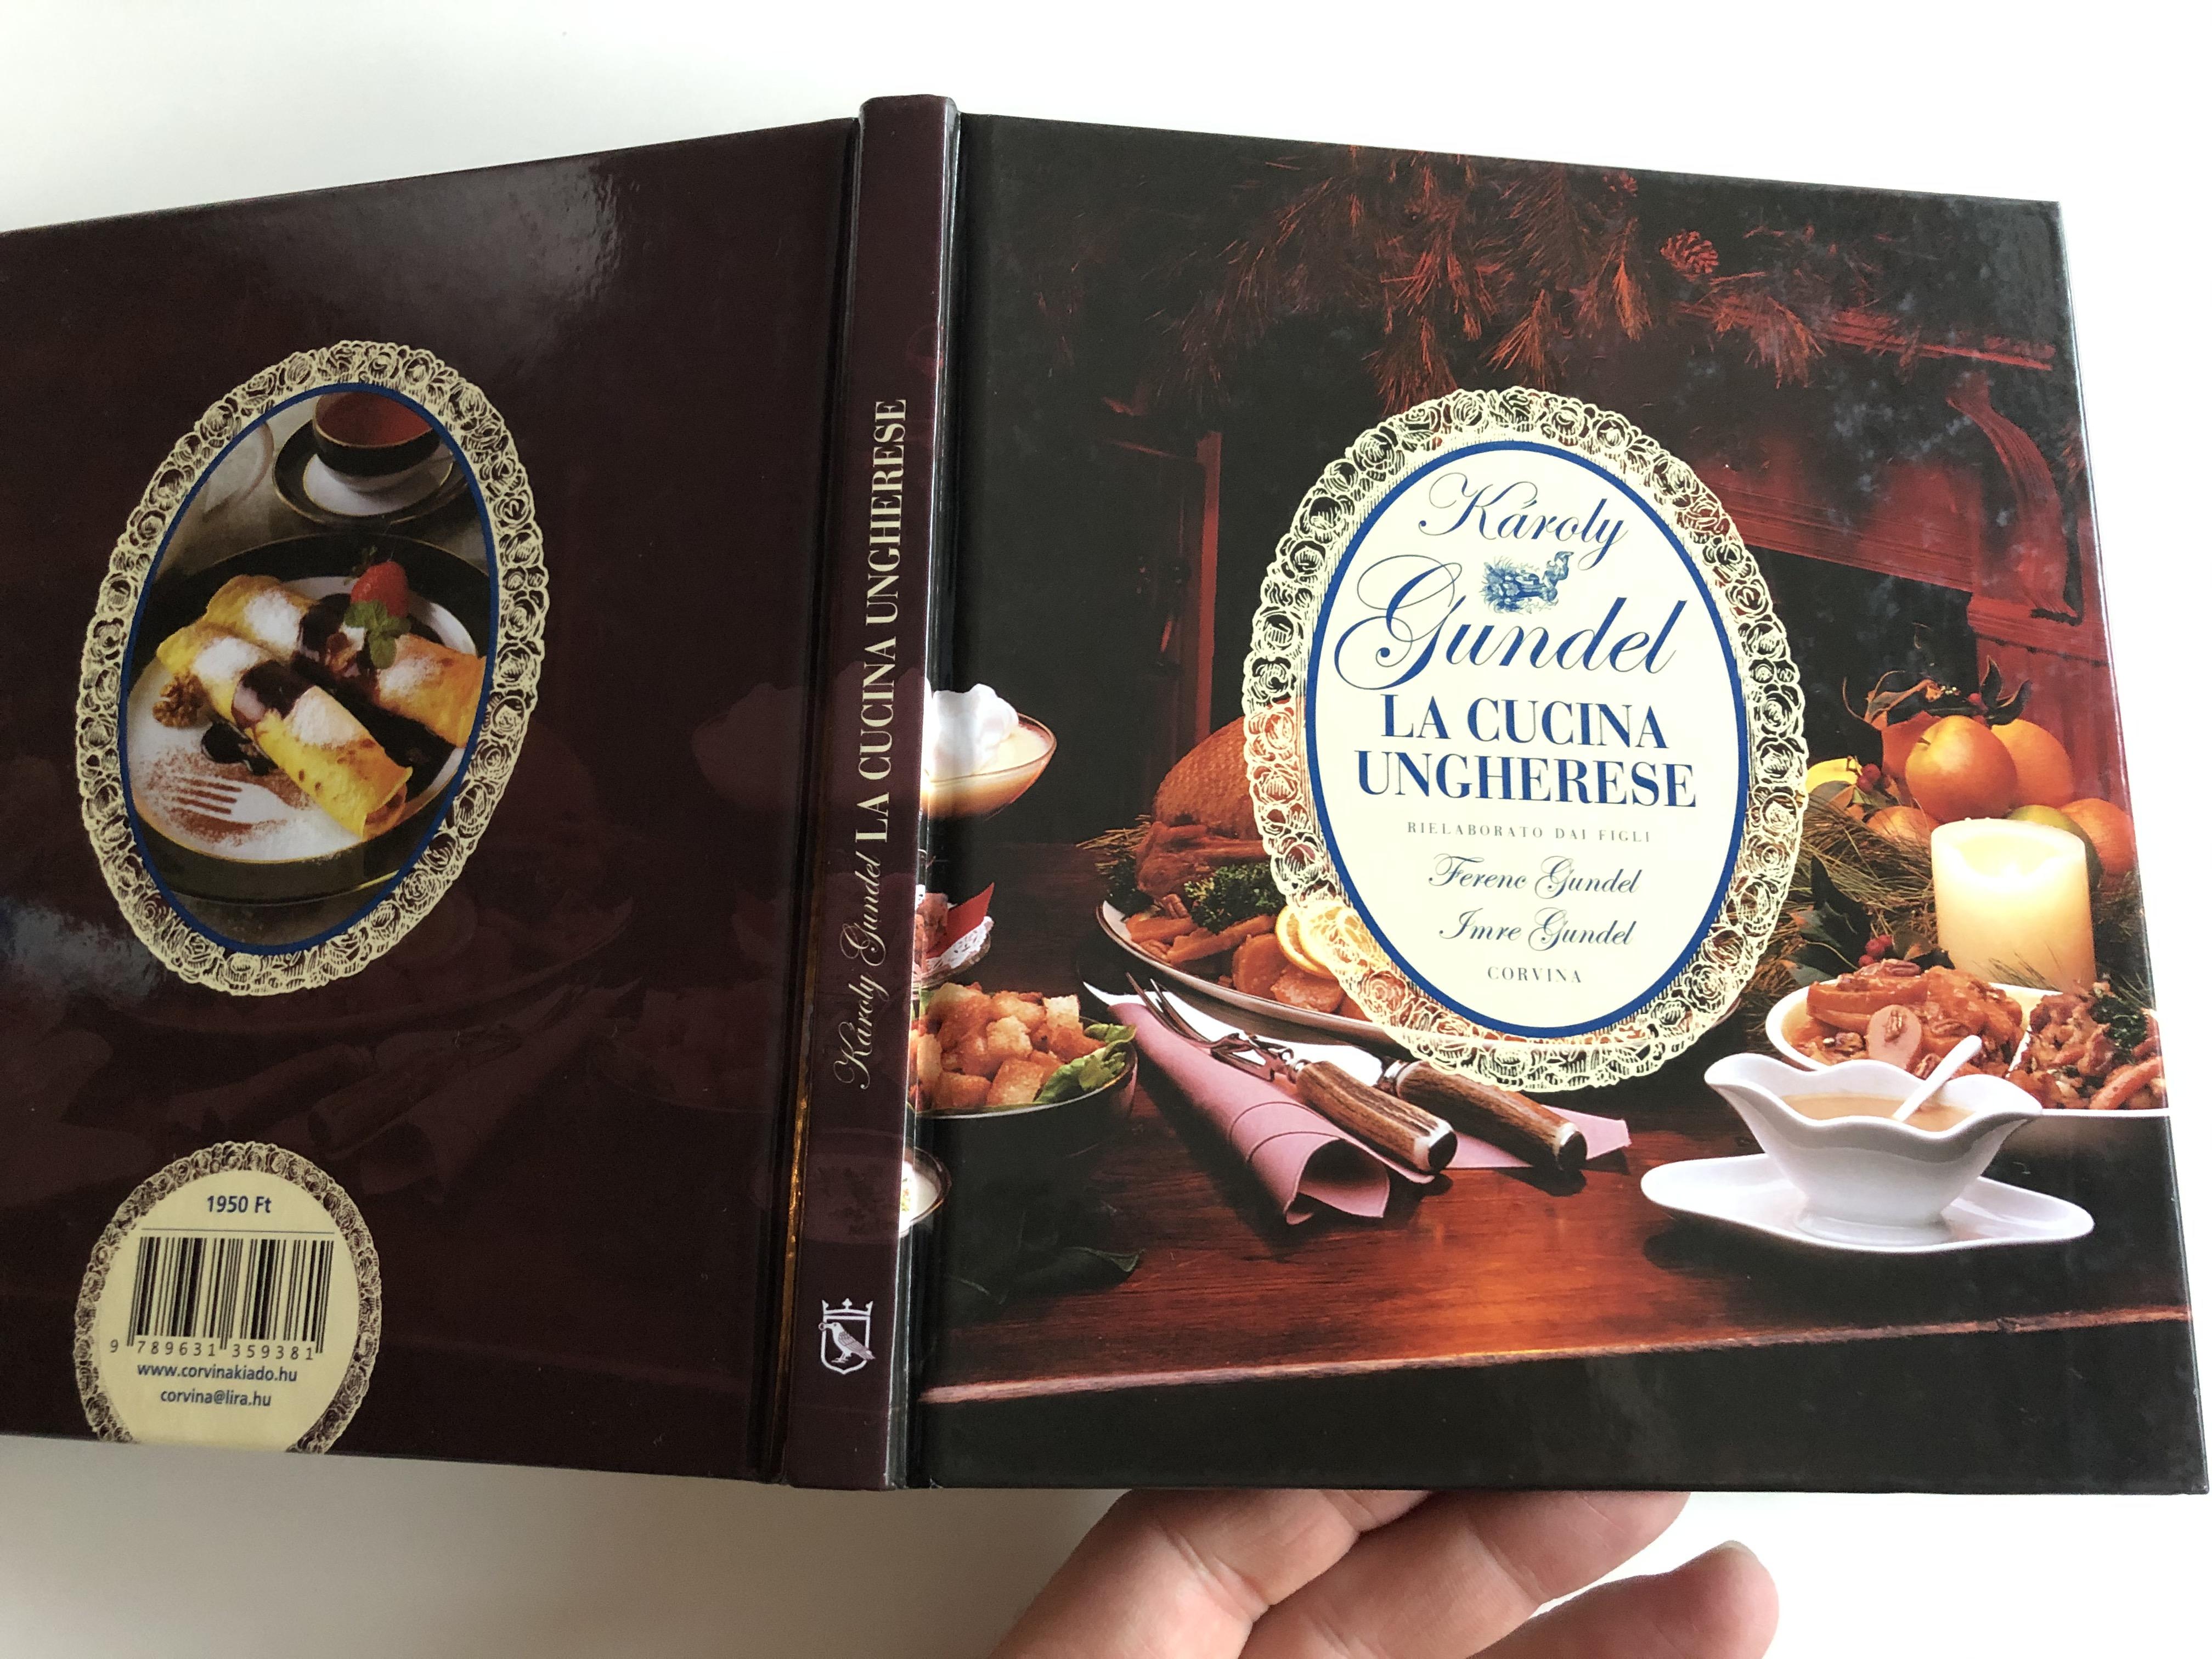 la-cucina-ungherese-by-k-roly-gundel-rielaborat-dai-figli-ferenc-gundel-imre-gundel-corvina-19.jpg